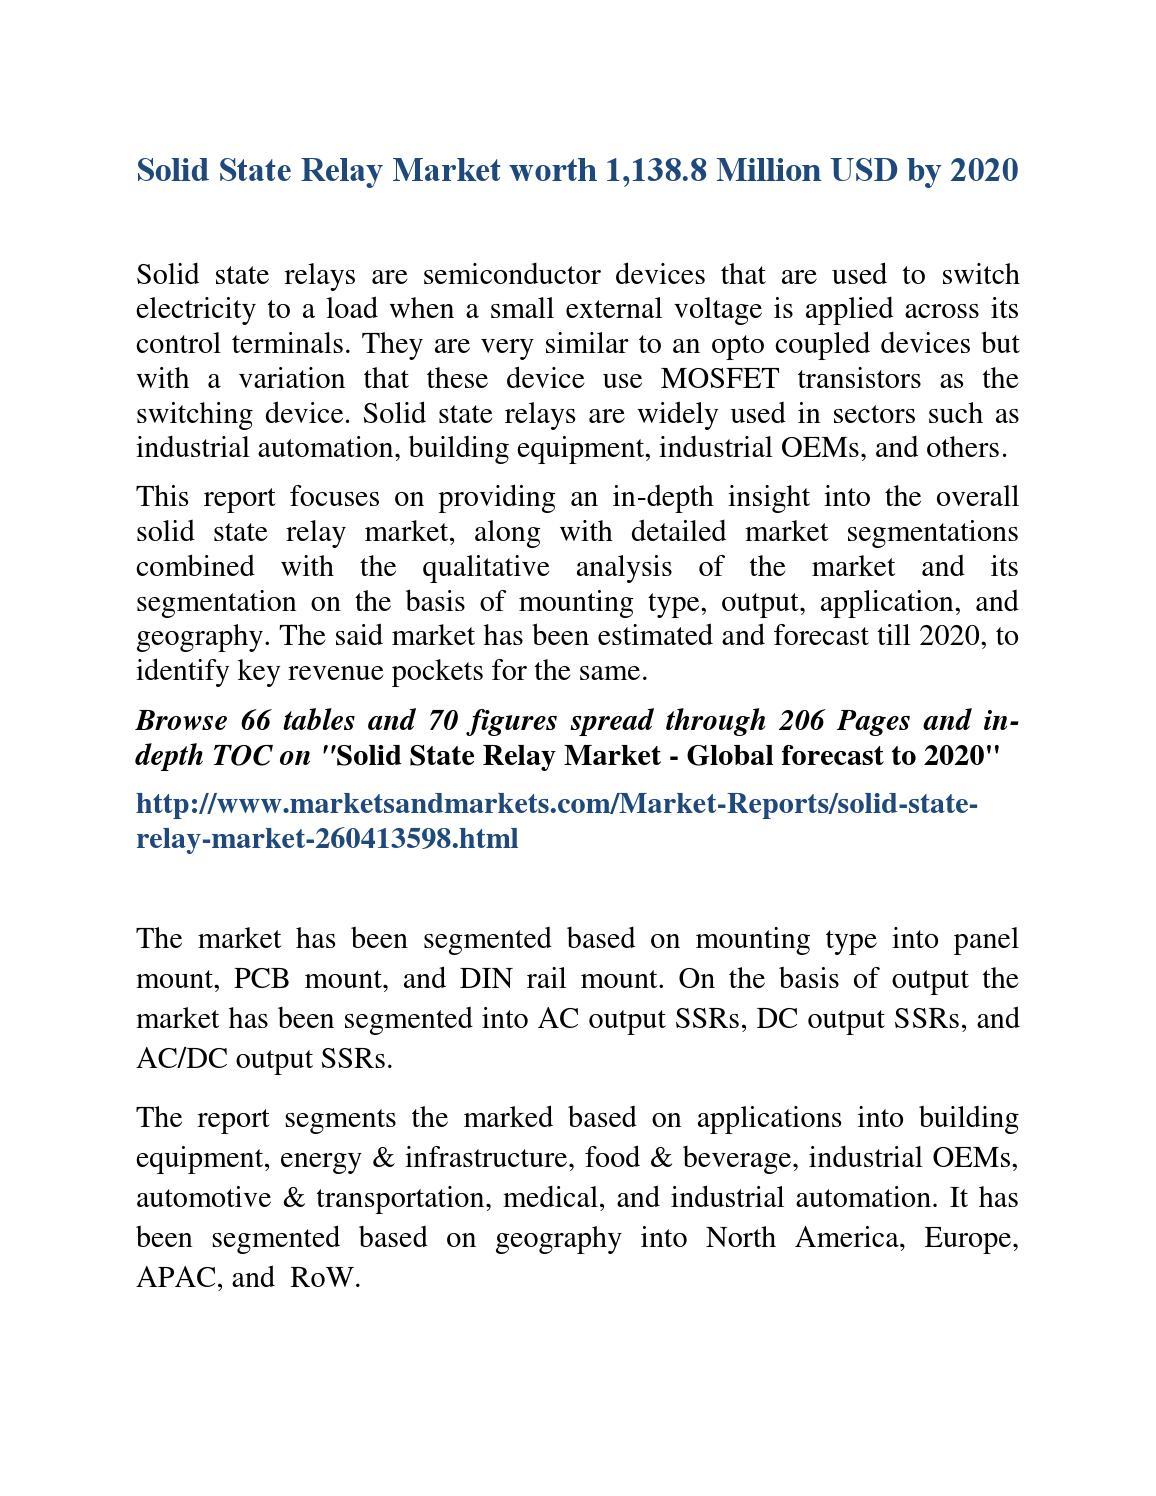 Solid State Relay Market By Mounting 2020 Marketsandmarkets Celduc Prashantv Issuu